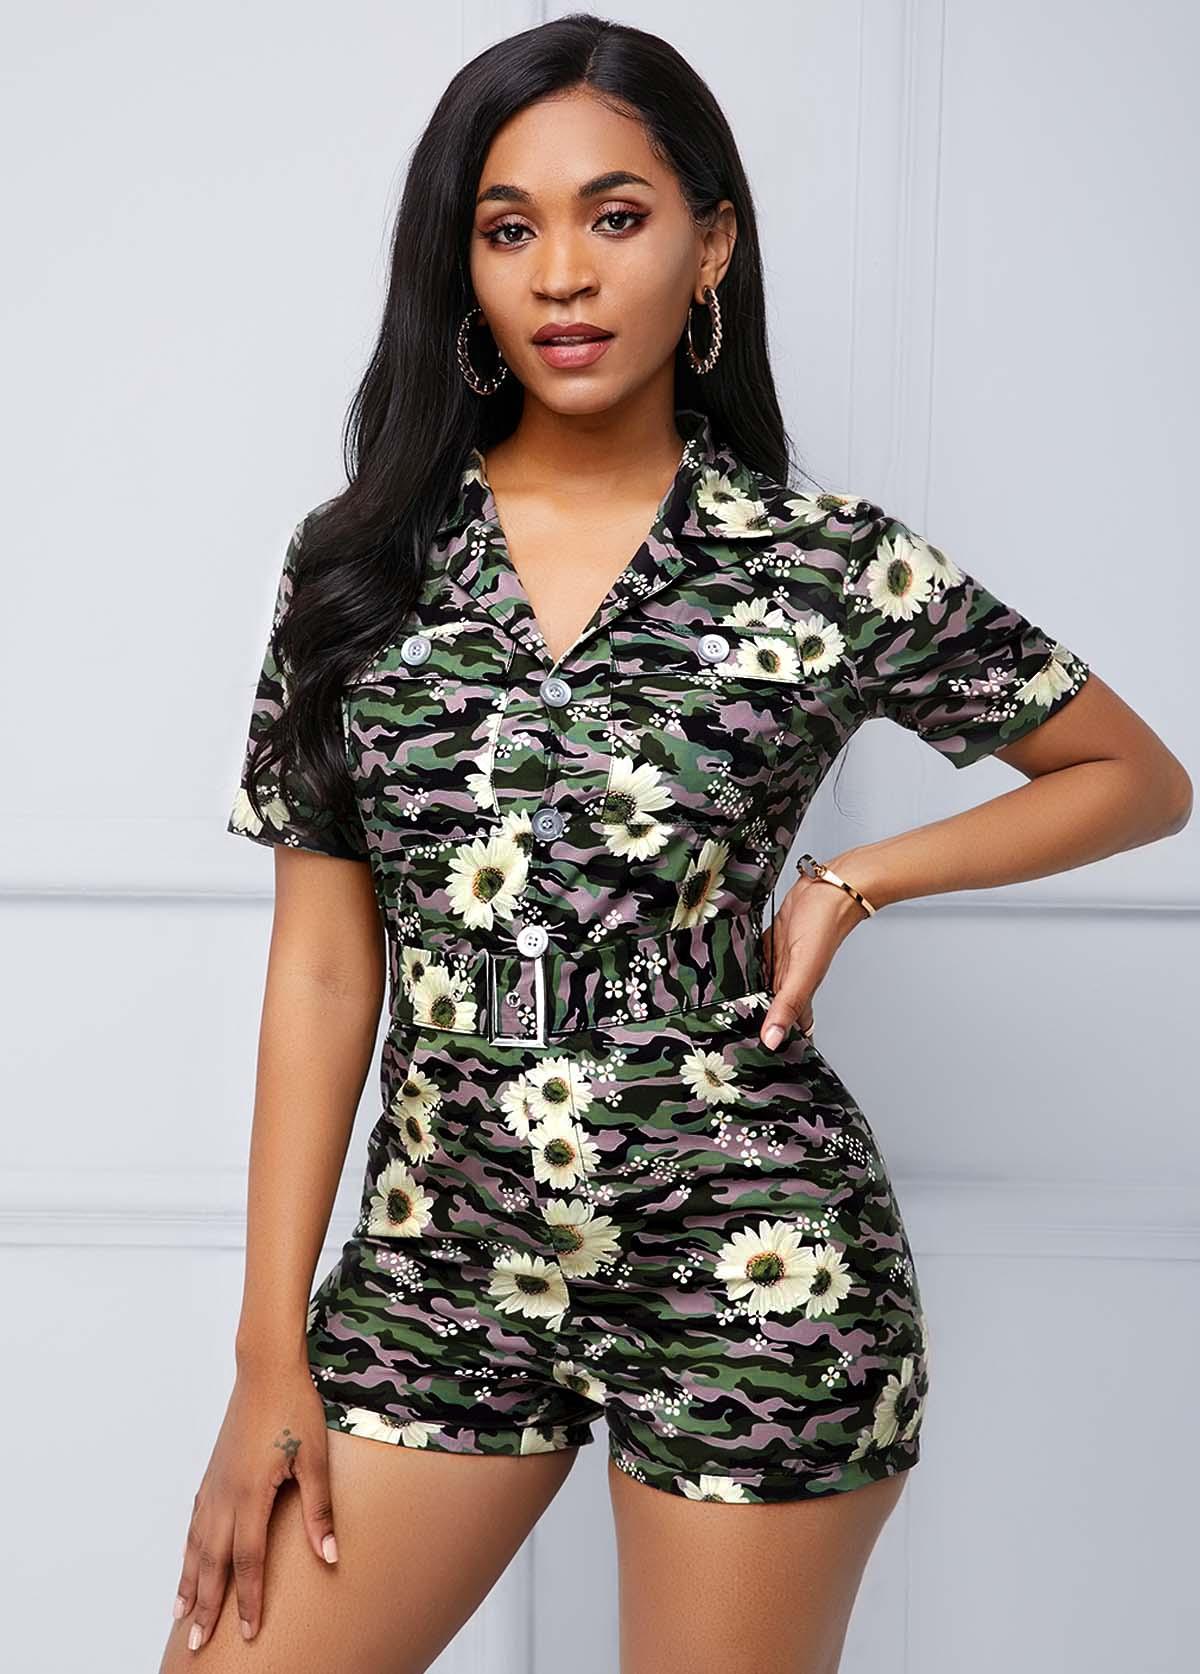 ROTITA Camouflage Print Short Sleeve V Neck Romper